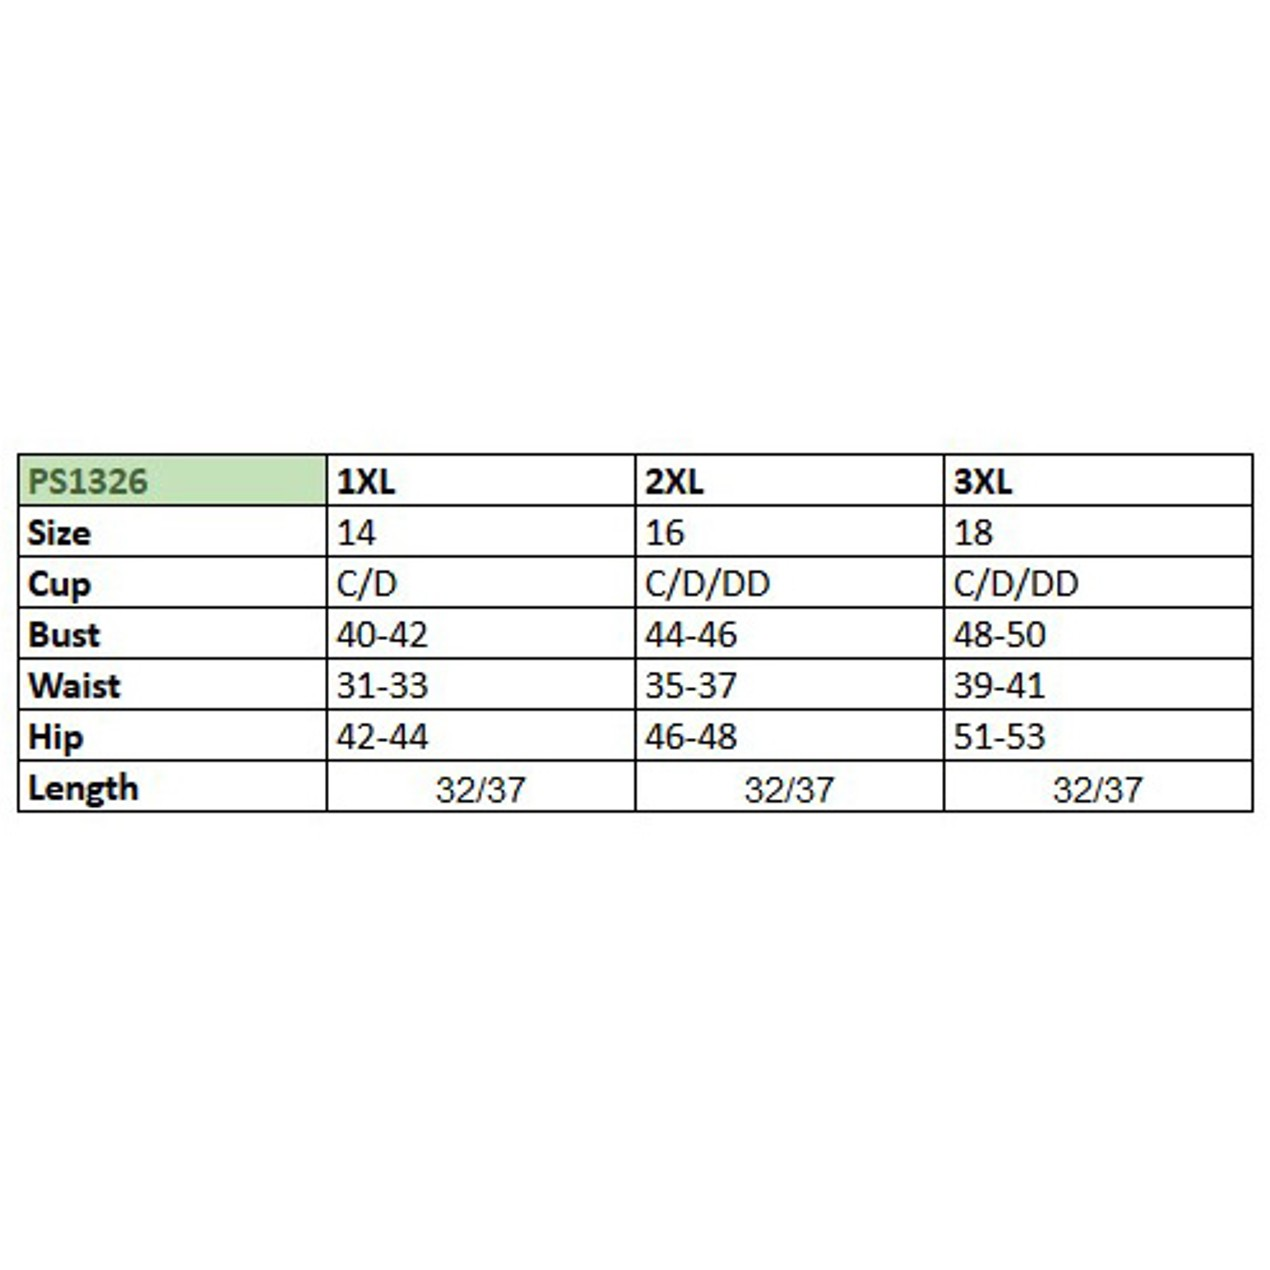 44383c1db5d White Mark Universal Plus Size Dulce Tunic Top - 5 Prints - Tanga